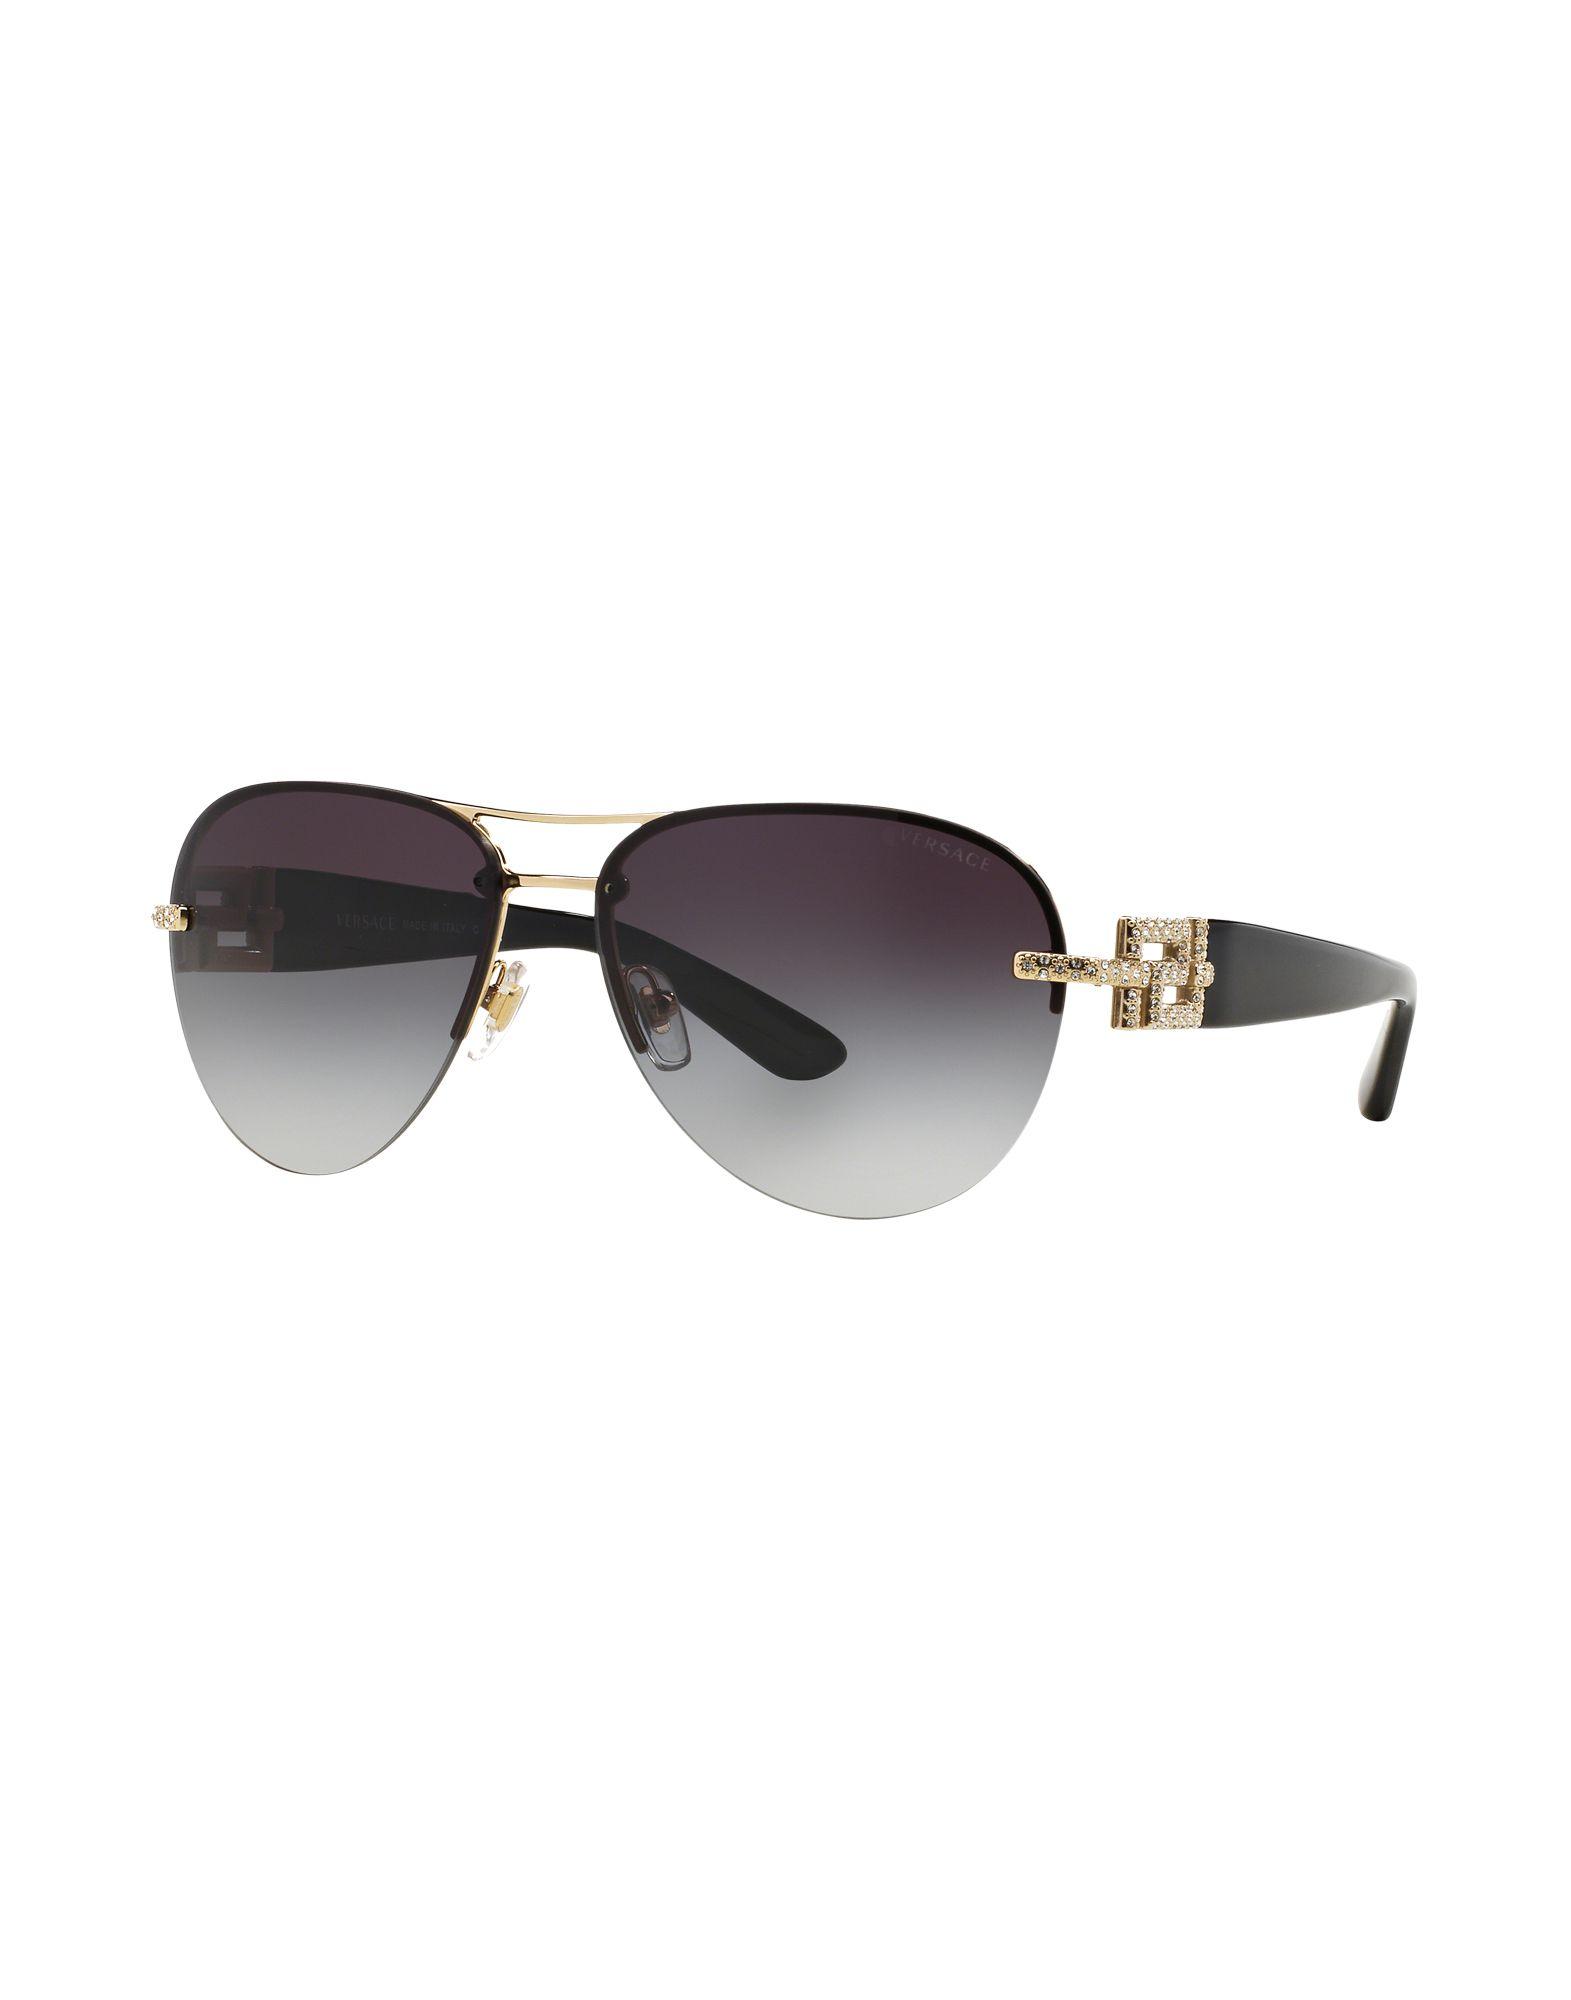 c0305f9275 Versace Sunglasses Women Versace Sunglasses 46413260HJ on PopScreen